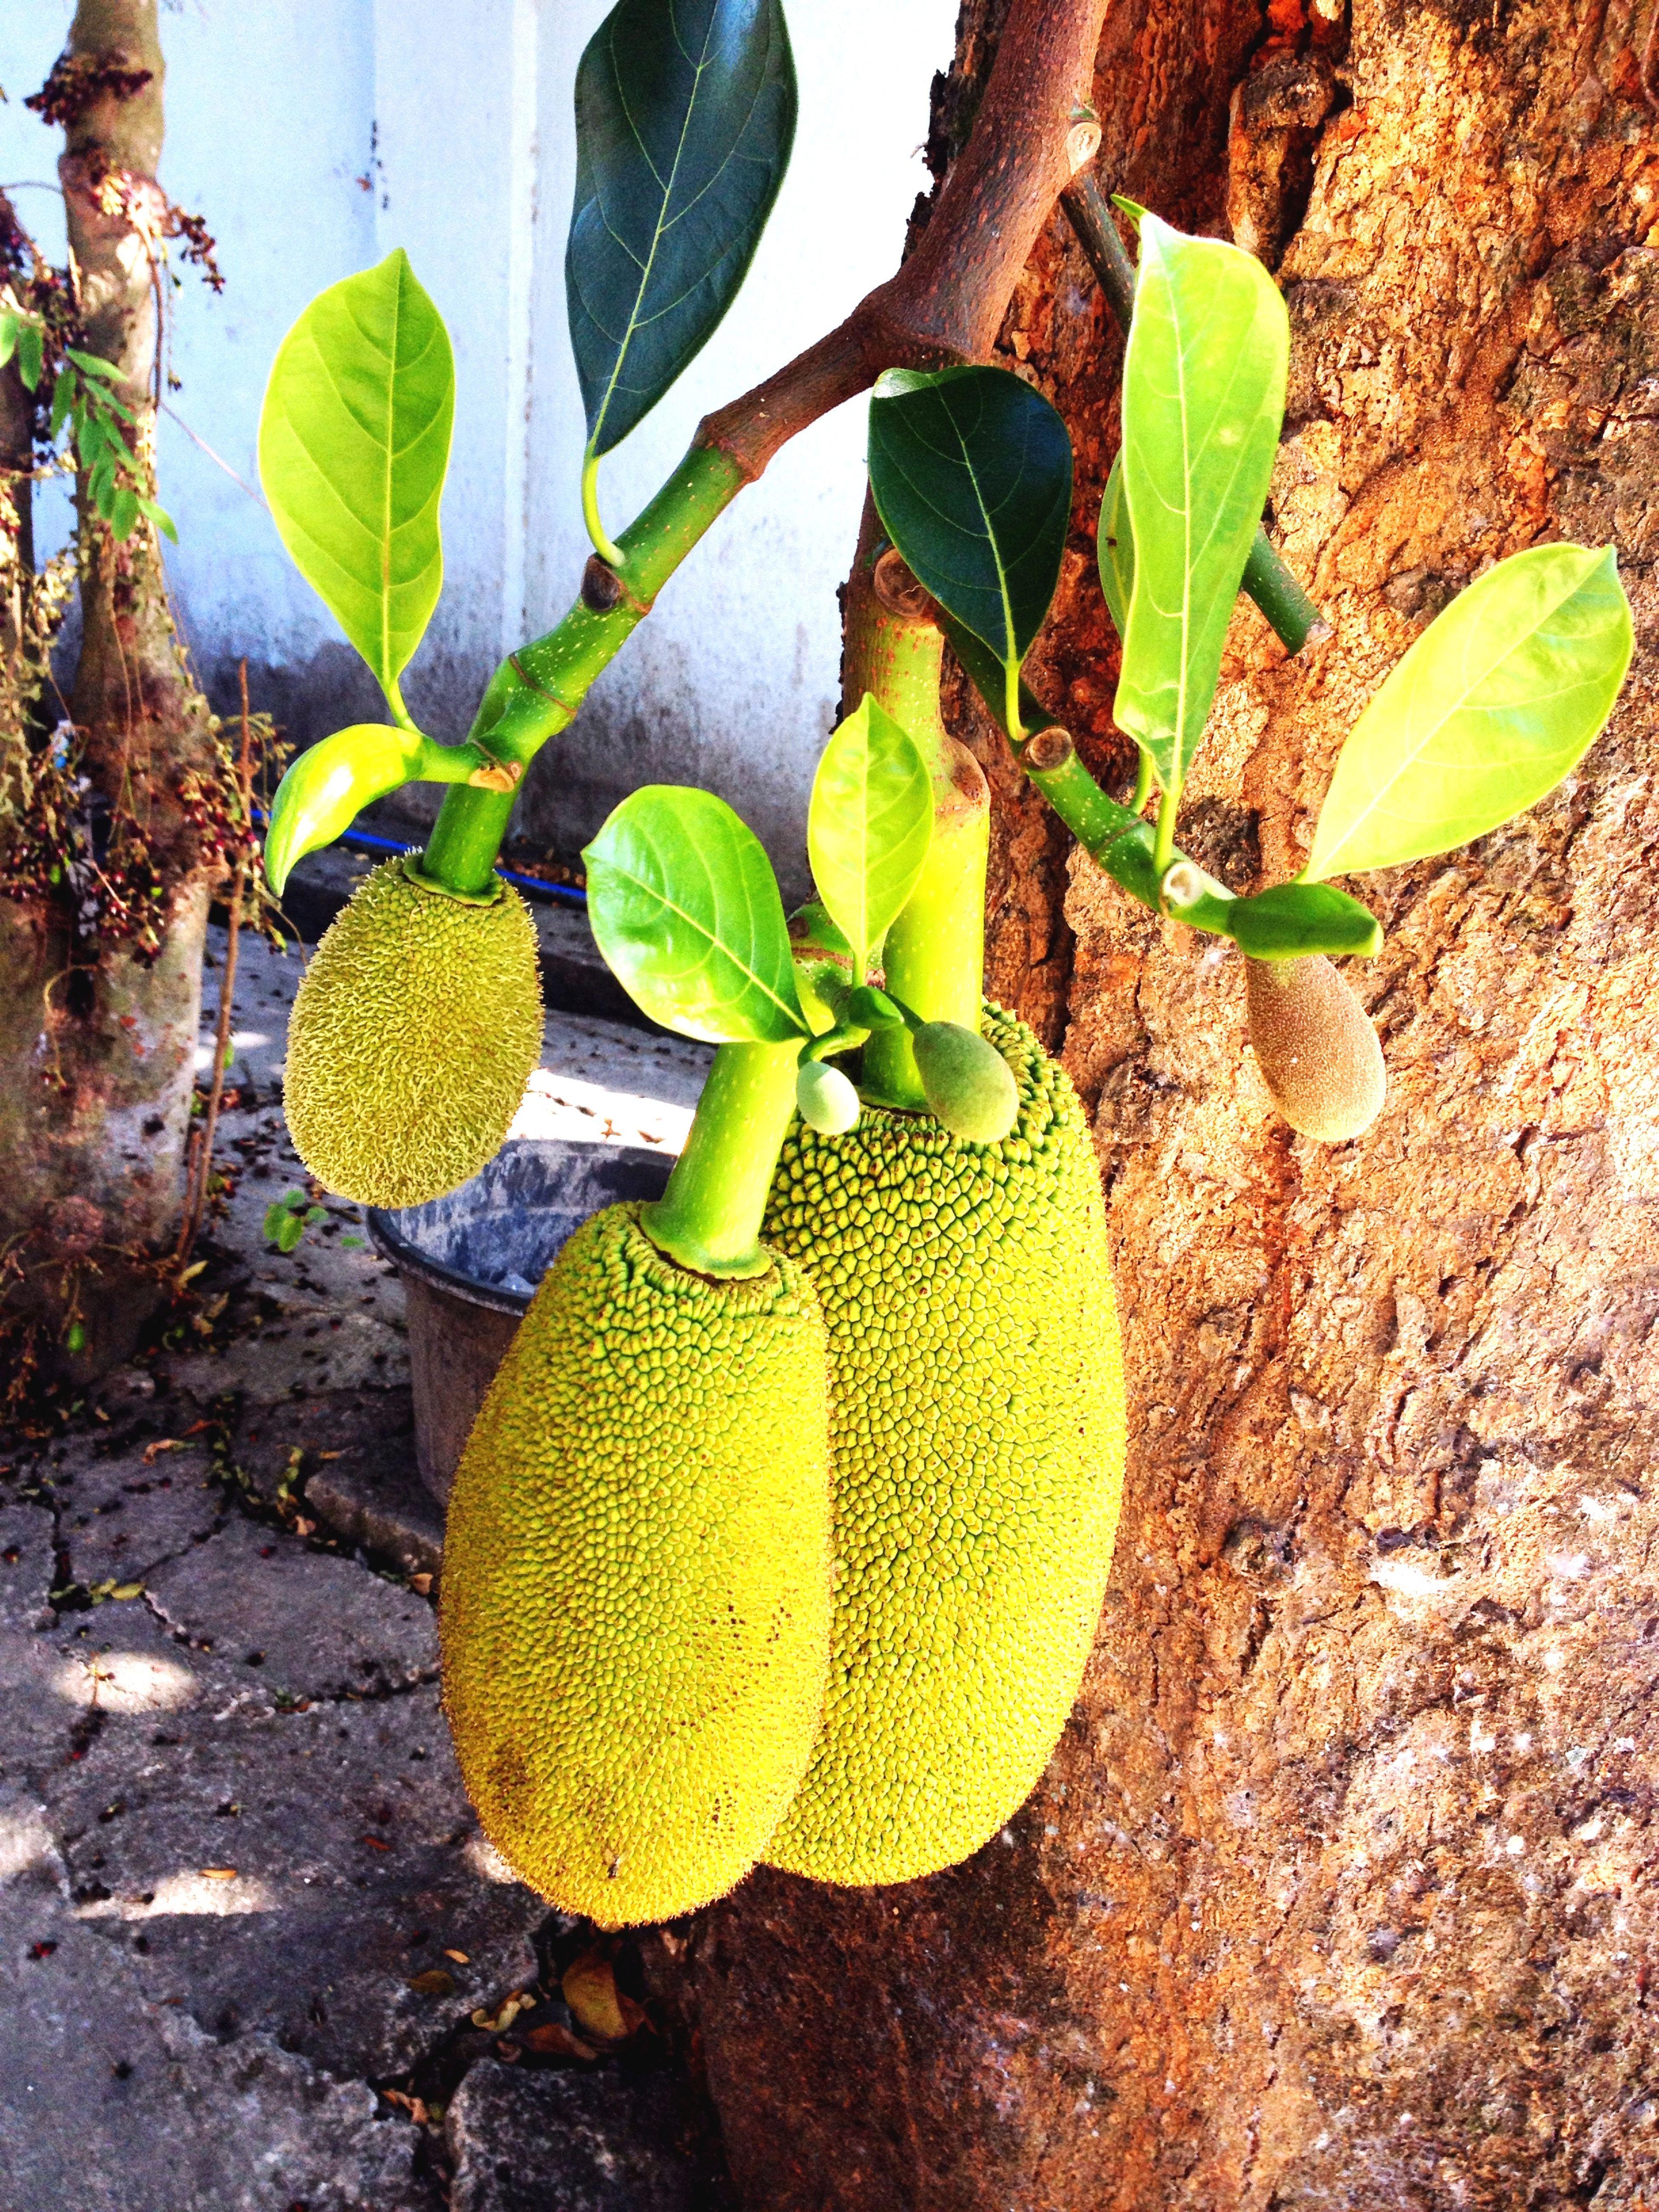 Bang On Target the jackfruit